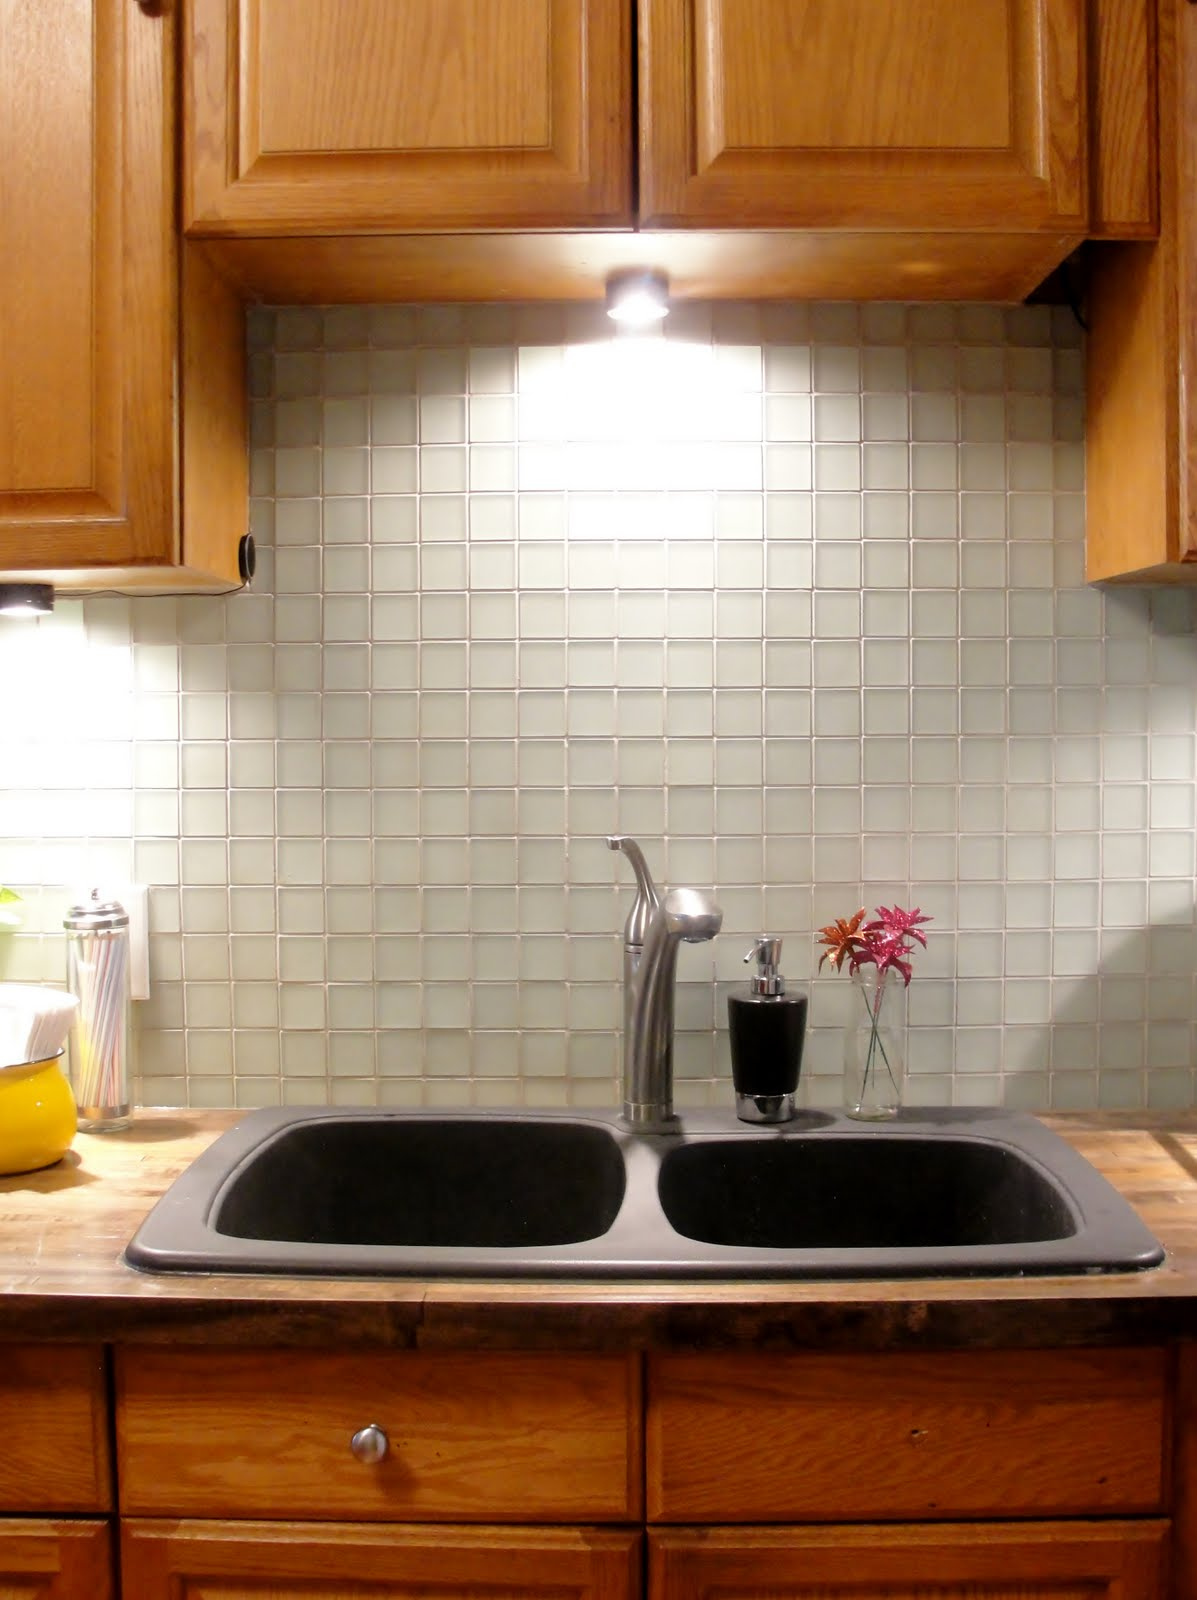 The ULTIMATE Weekender: DIY Concrete Countertops. >>